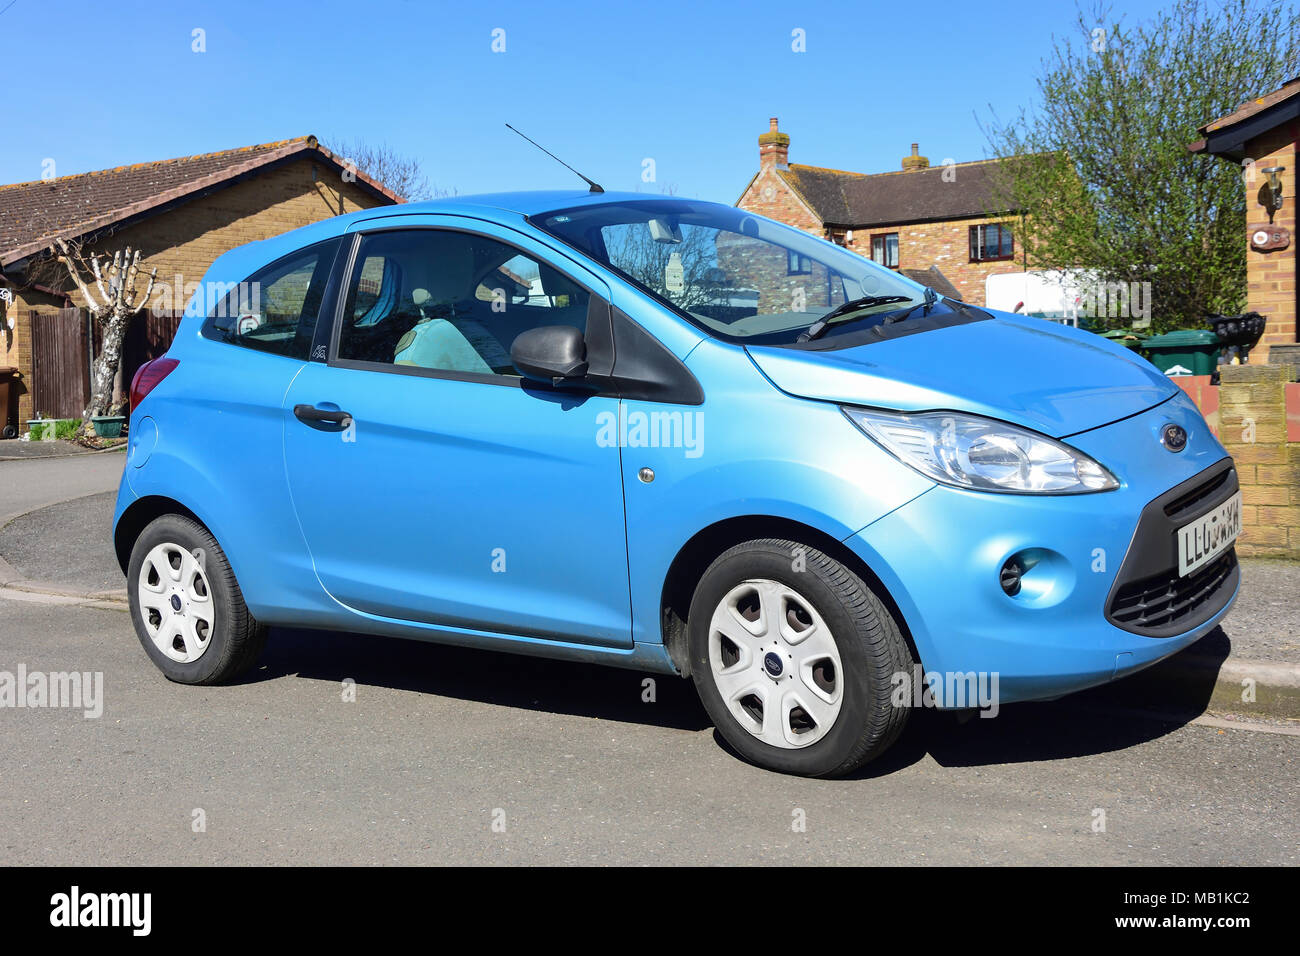 Automobile Ford Ka bleu stationné sur la route, Stanwell Moor, Surrey, Angleterre, Royaume-Uni Photo Stock